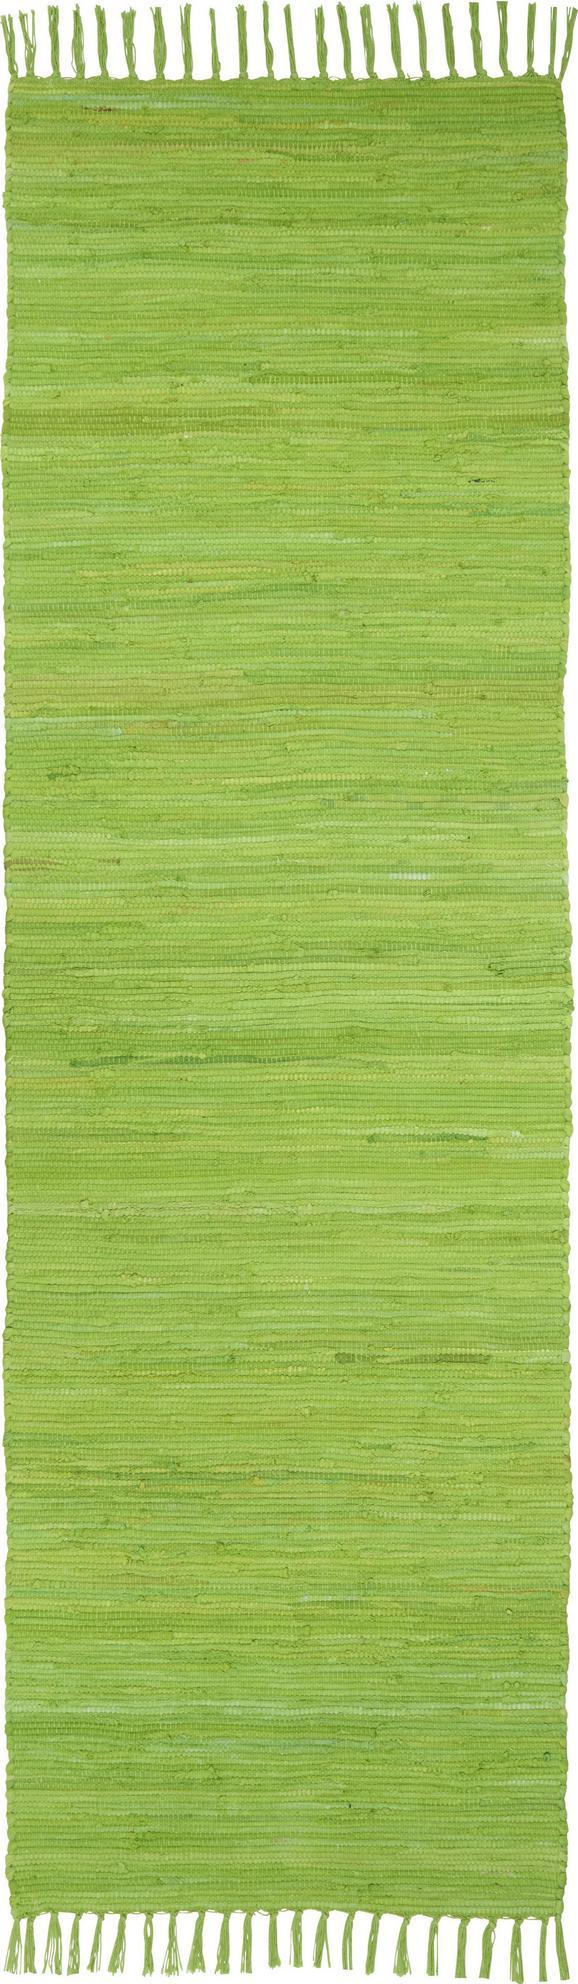 Fleckerlteppich Julia - Hellgrün, KONVENTIONELL, Textil (70/230cm) - Mömax modern living